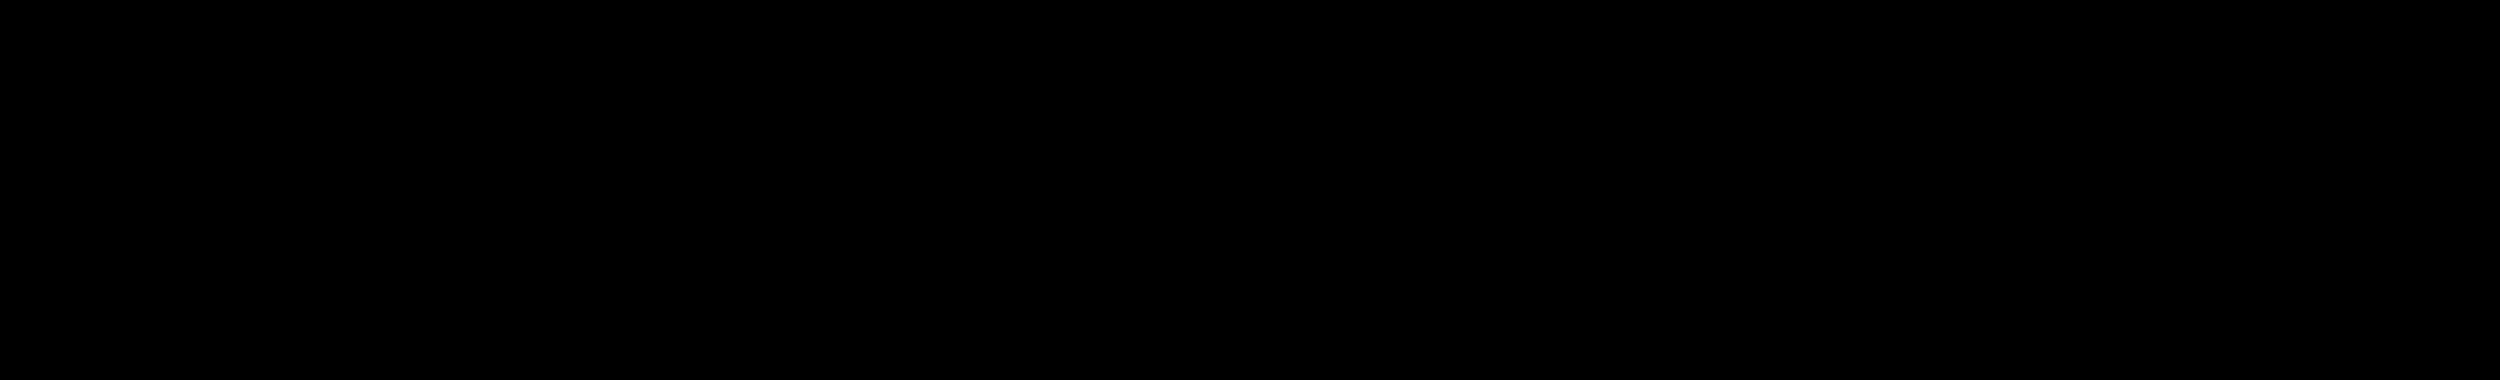 Squarespace_logo_wordmark.png